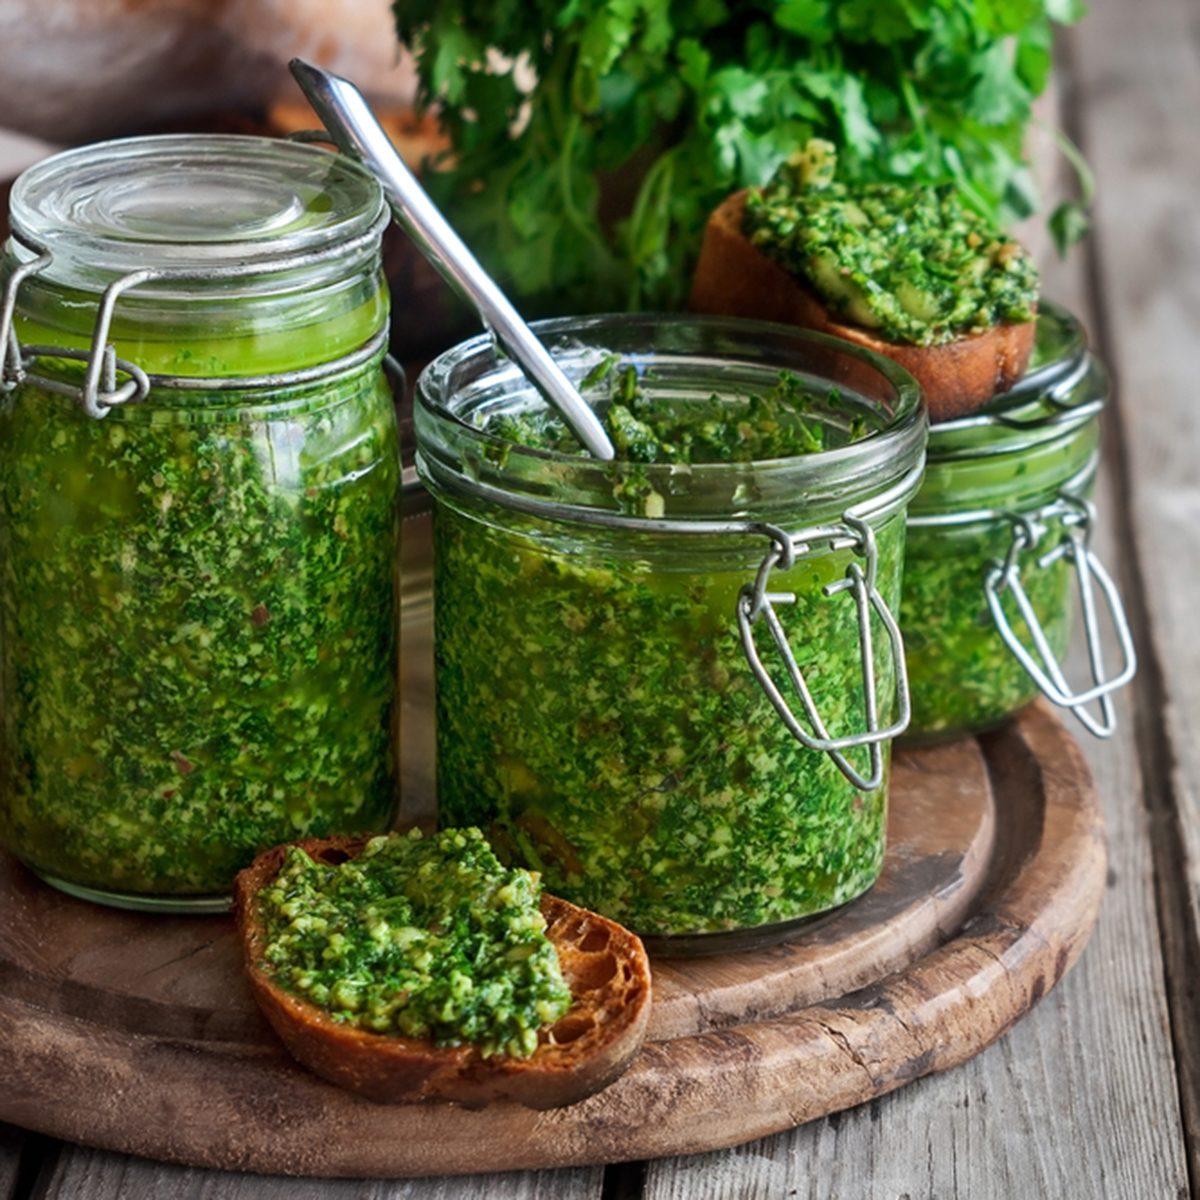 Homemade cilantro pesto in jars on wooden background